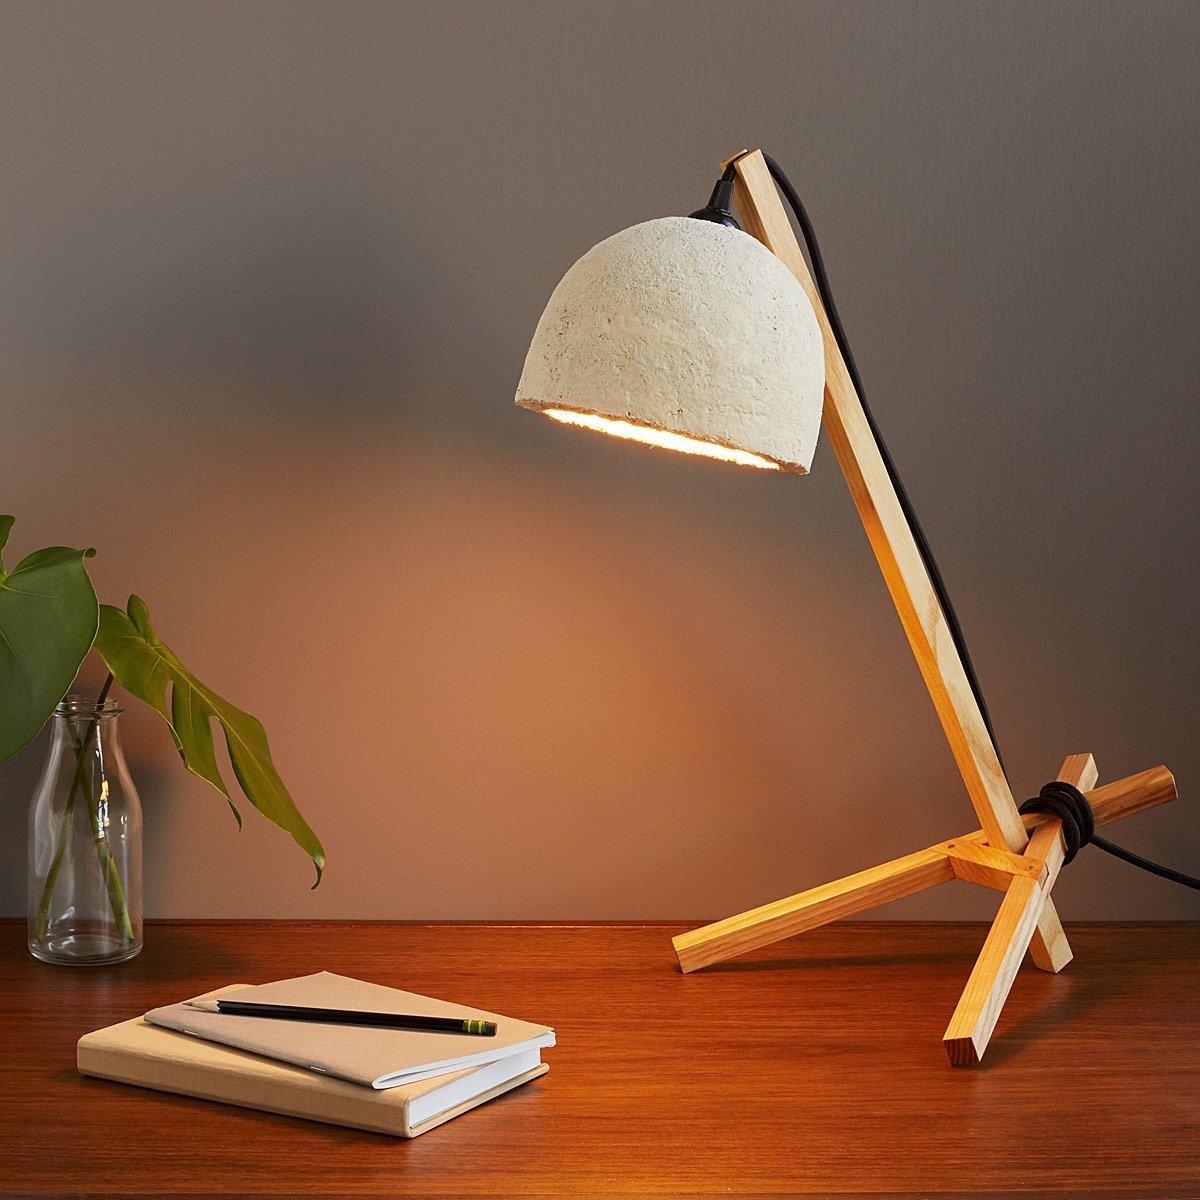 The Mushroom Lamp | UncommonGoods